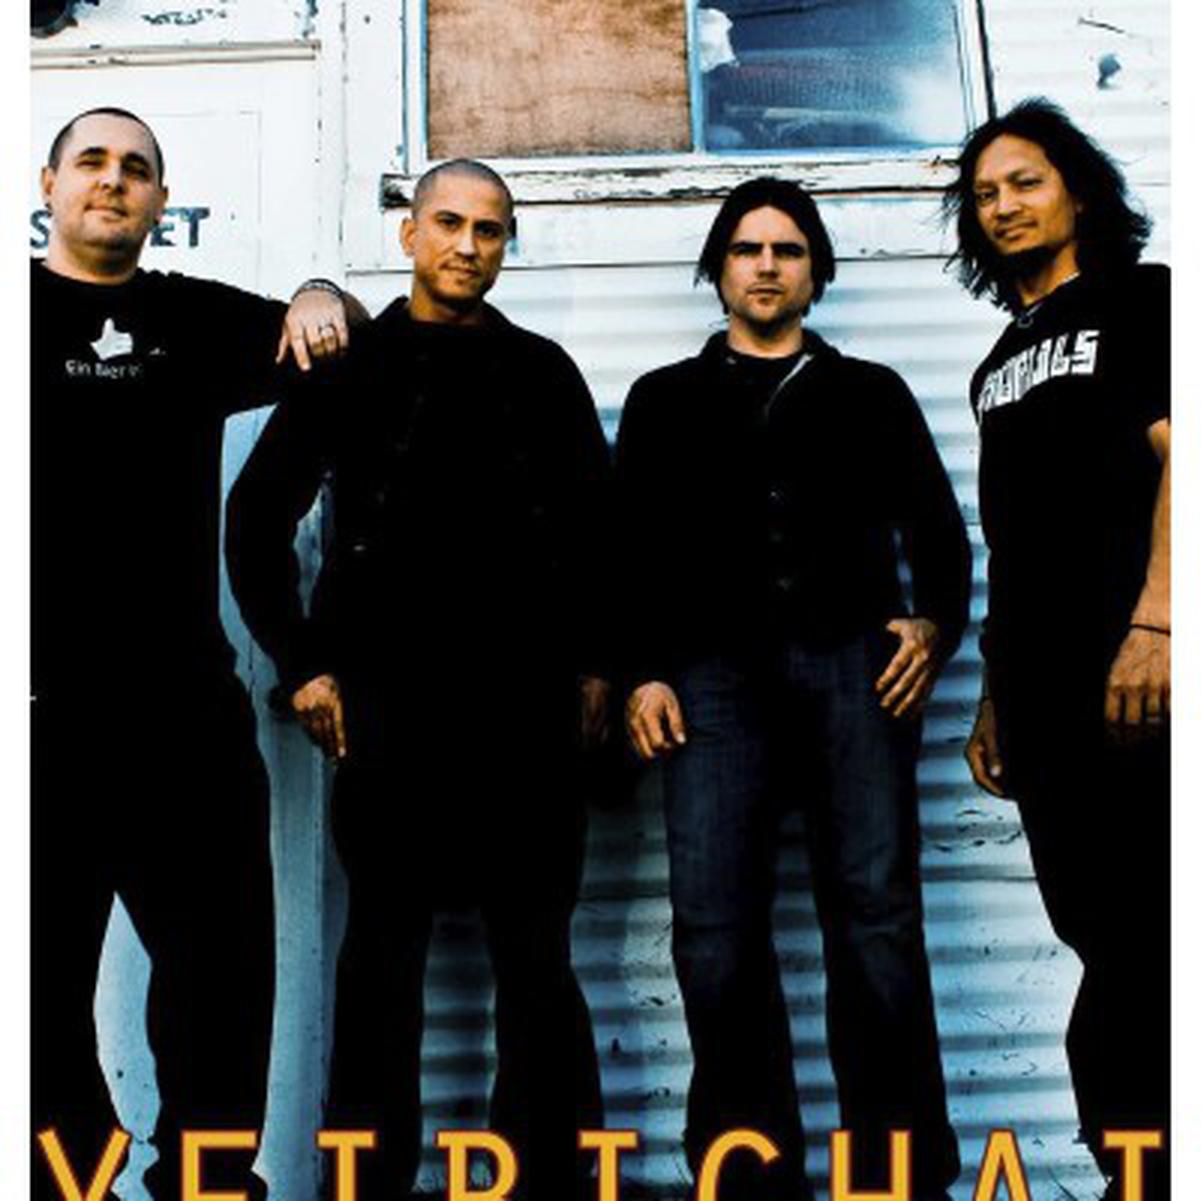 YEIBICHAI